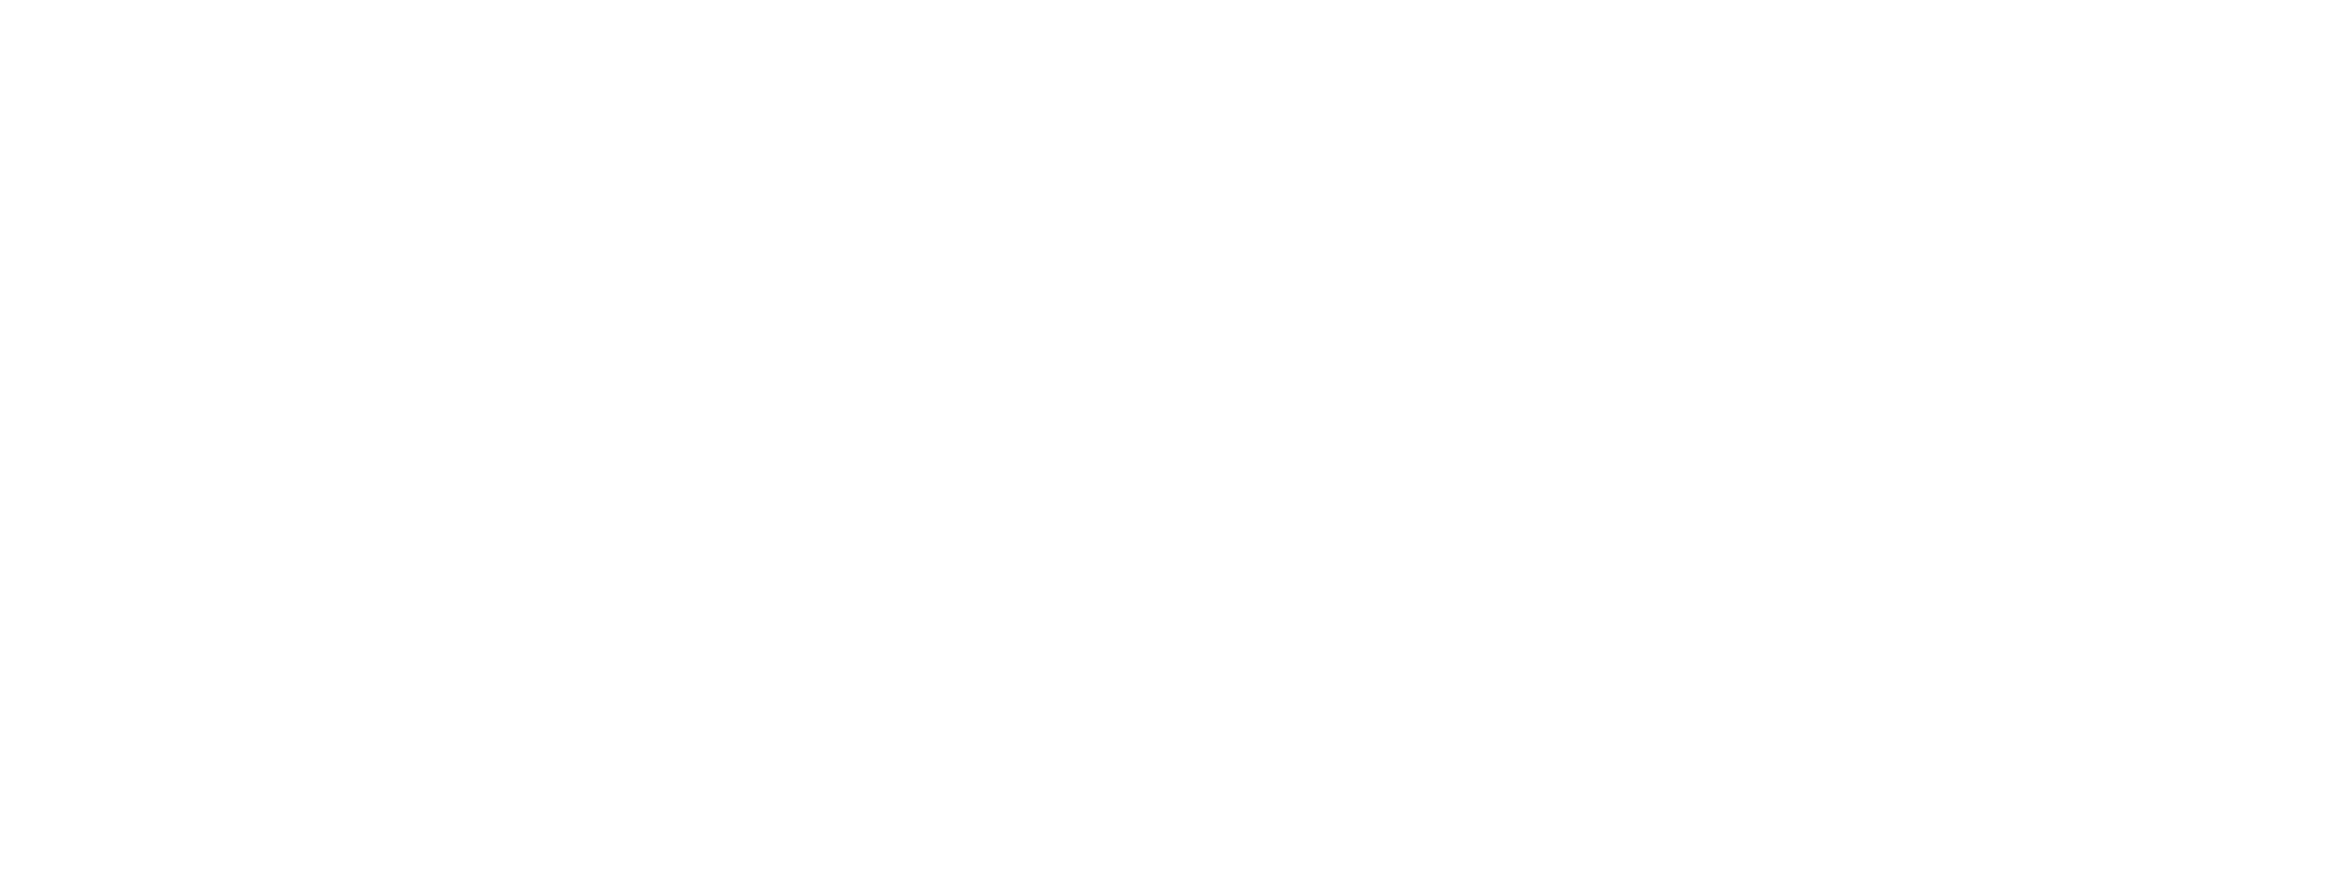 Office of the President : สำนักงานอธิการบดี มหาวิทยาลัยขอนแก่น